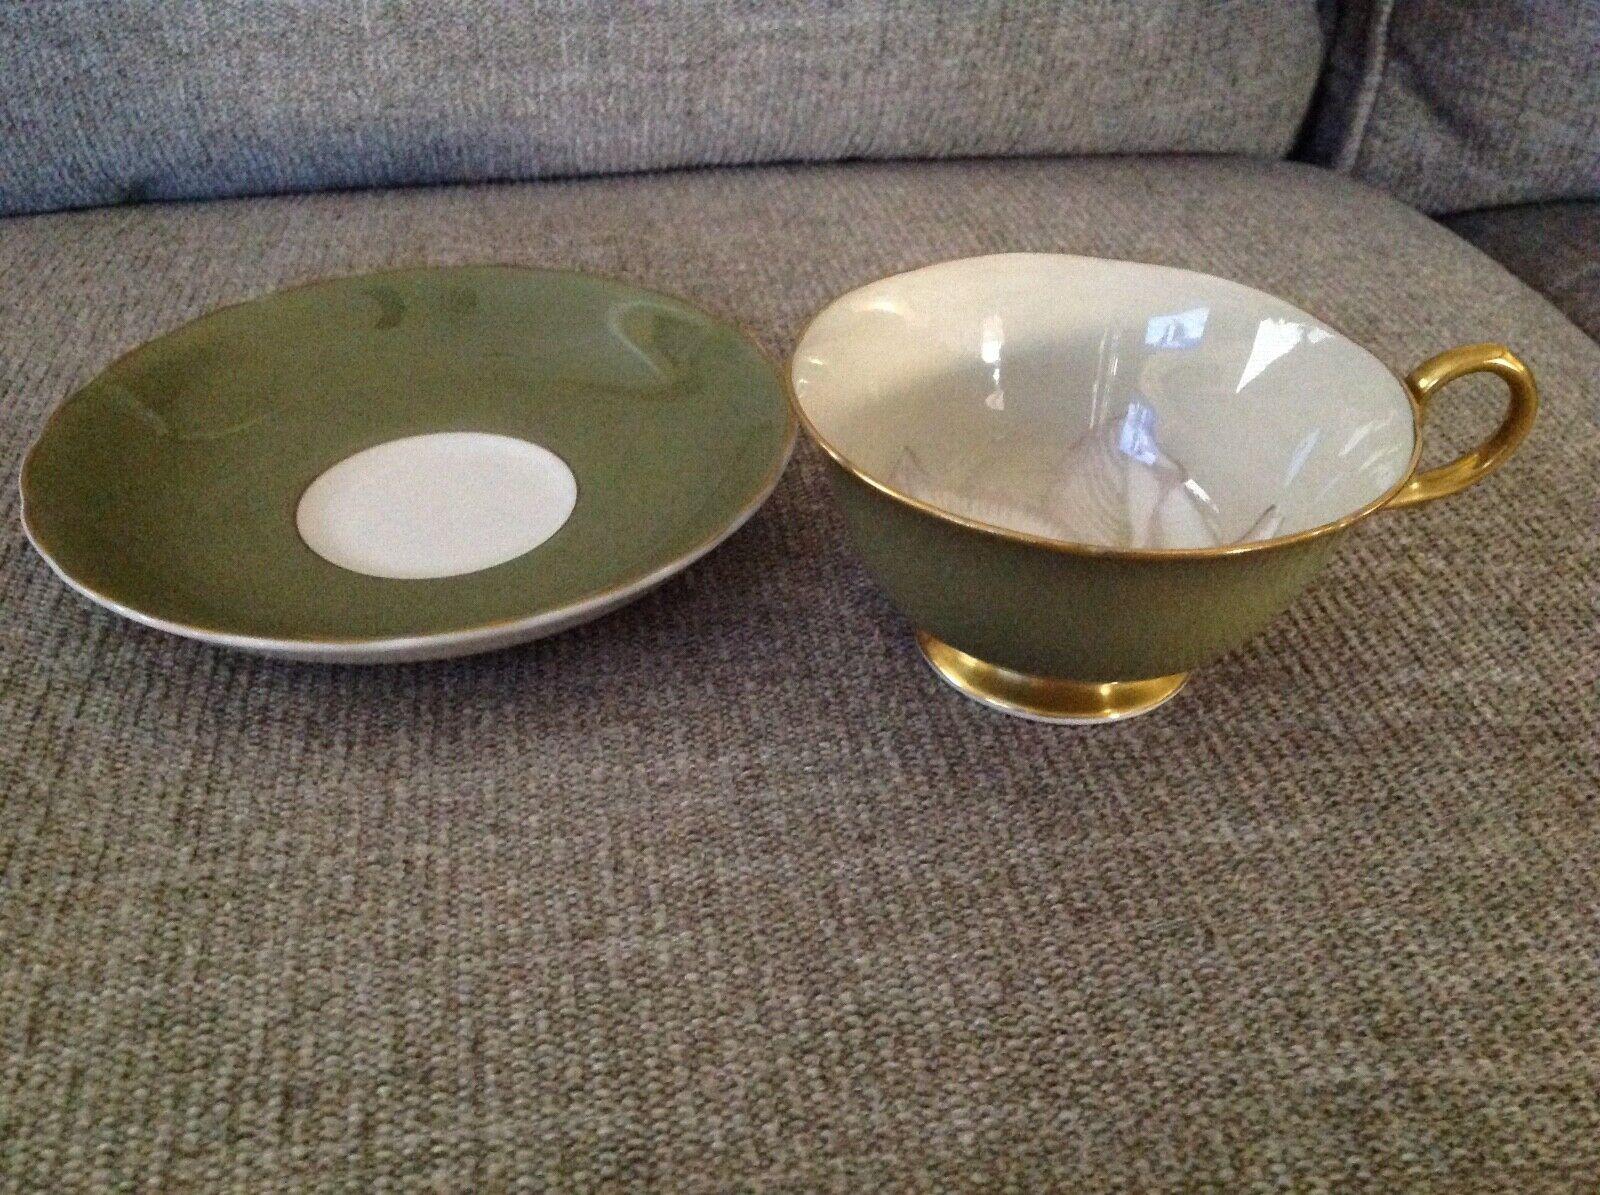 Vintage England Fine Bone China Tea Cup Saucer - $14.95